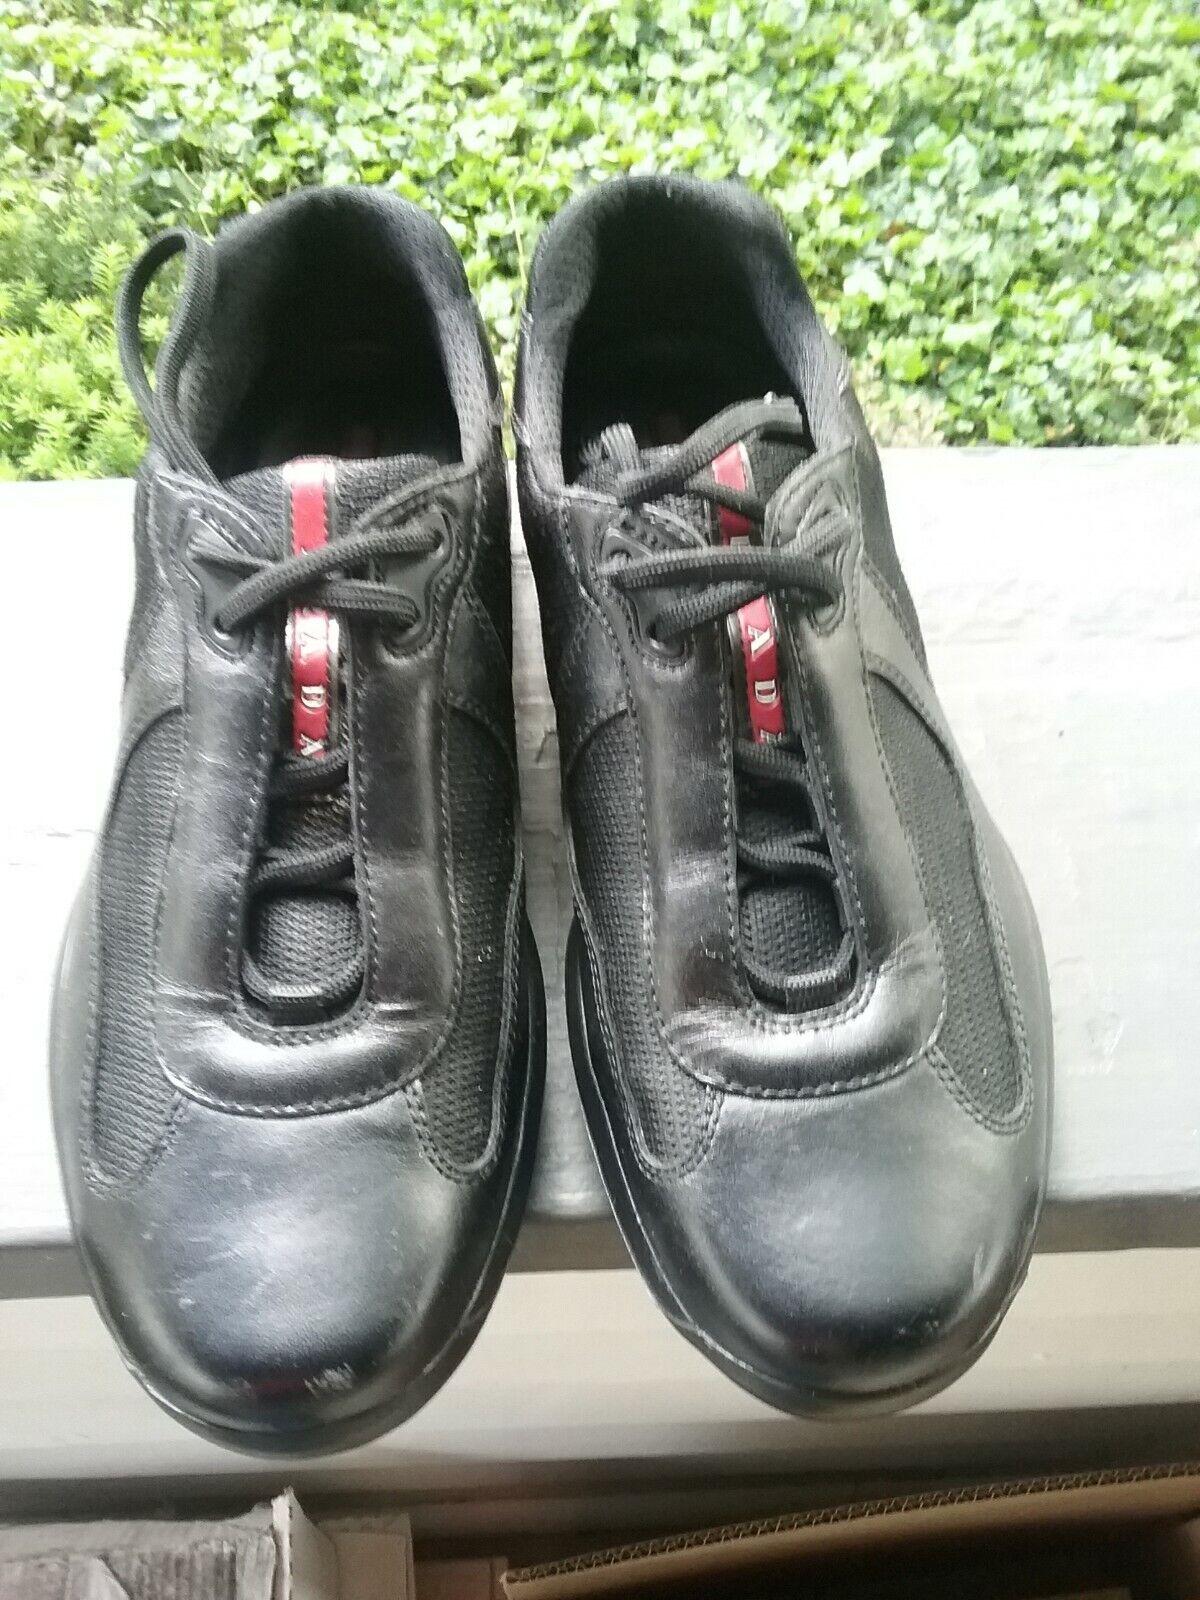 Prada tennis tennis tennis shoes PS 0906 7.5 US c2fabd